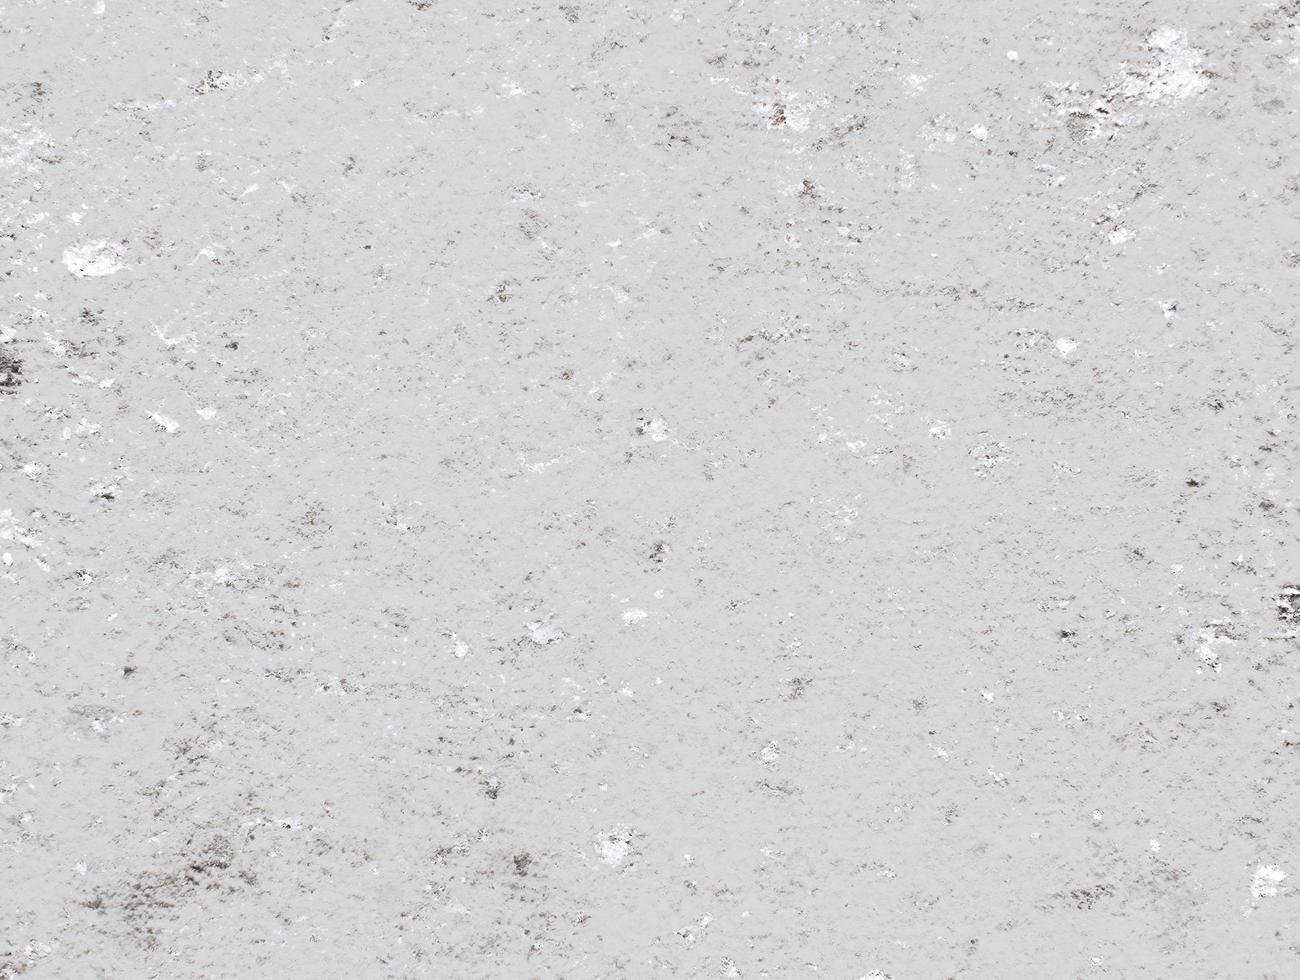 granieten steen textuur achtergrond foto